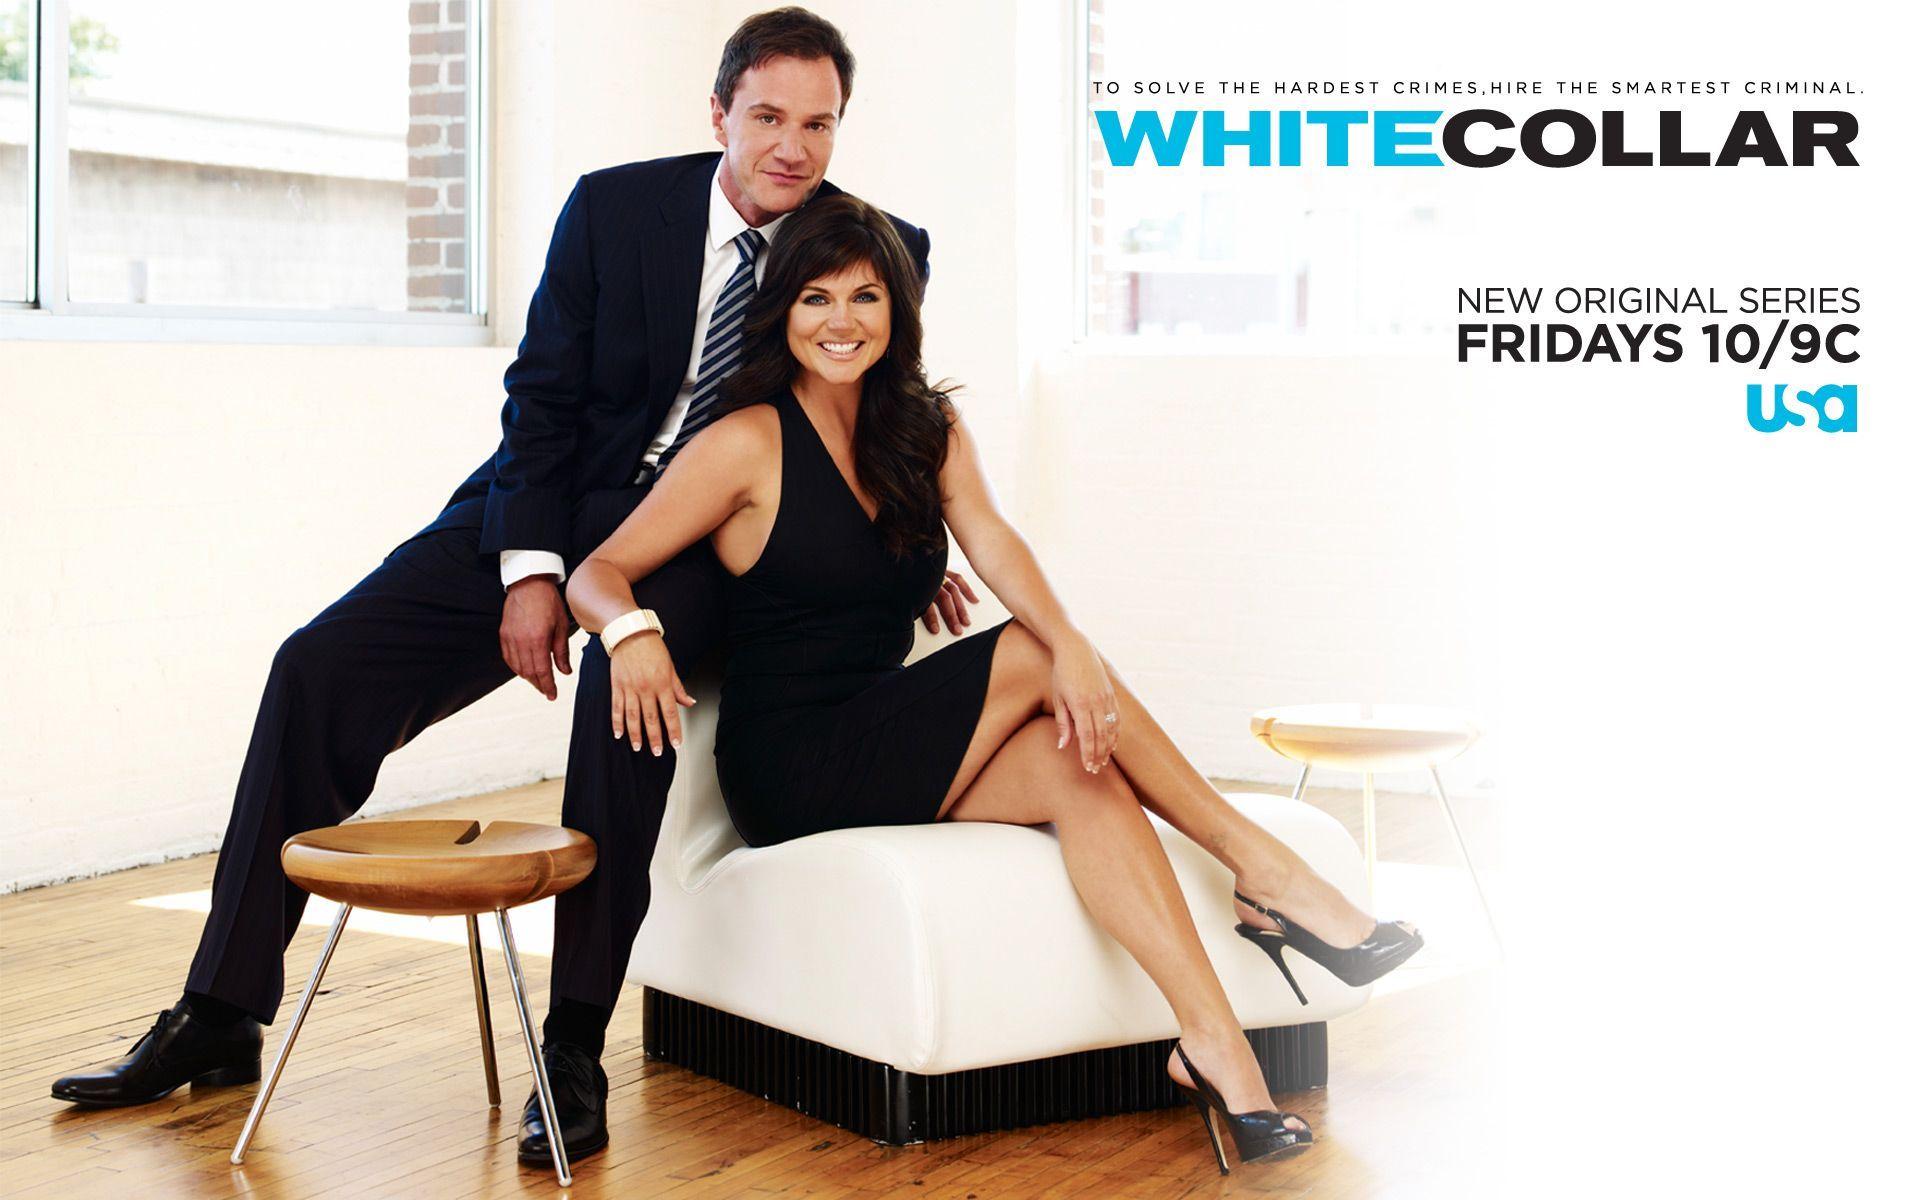 white collar on Netflix